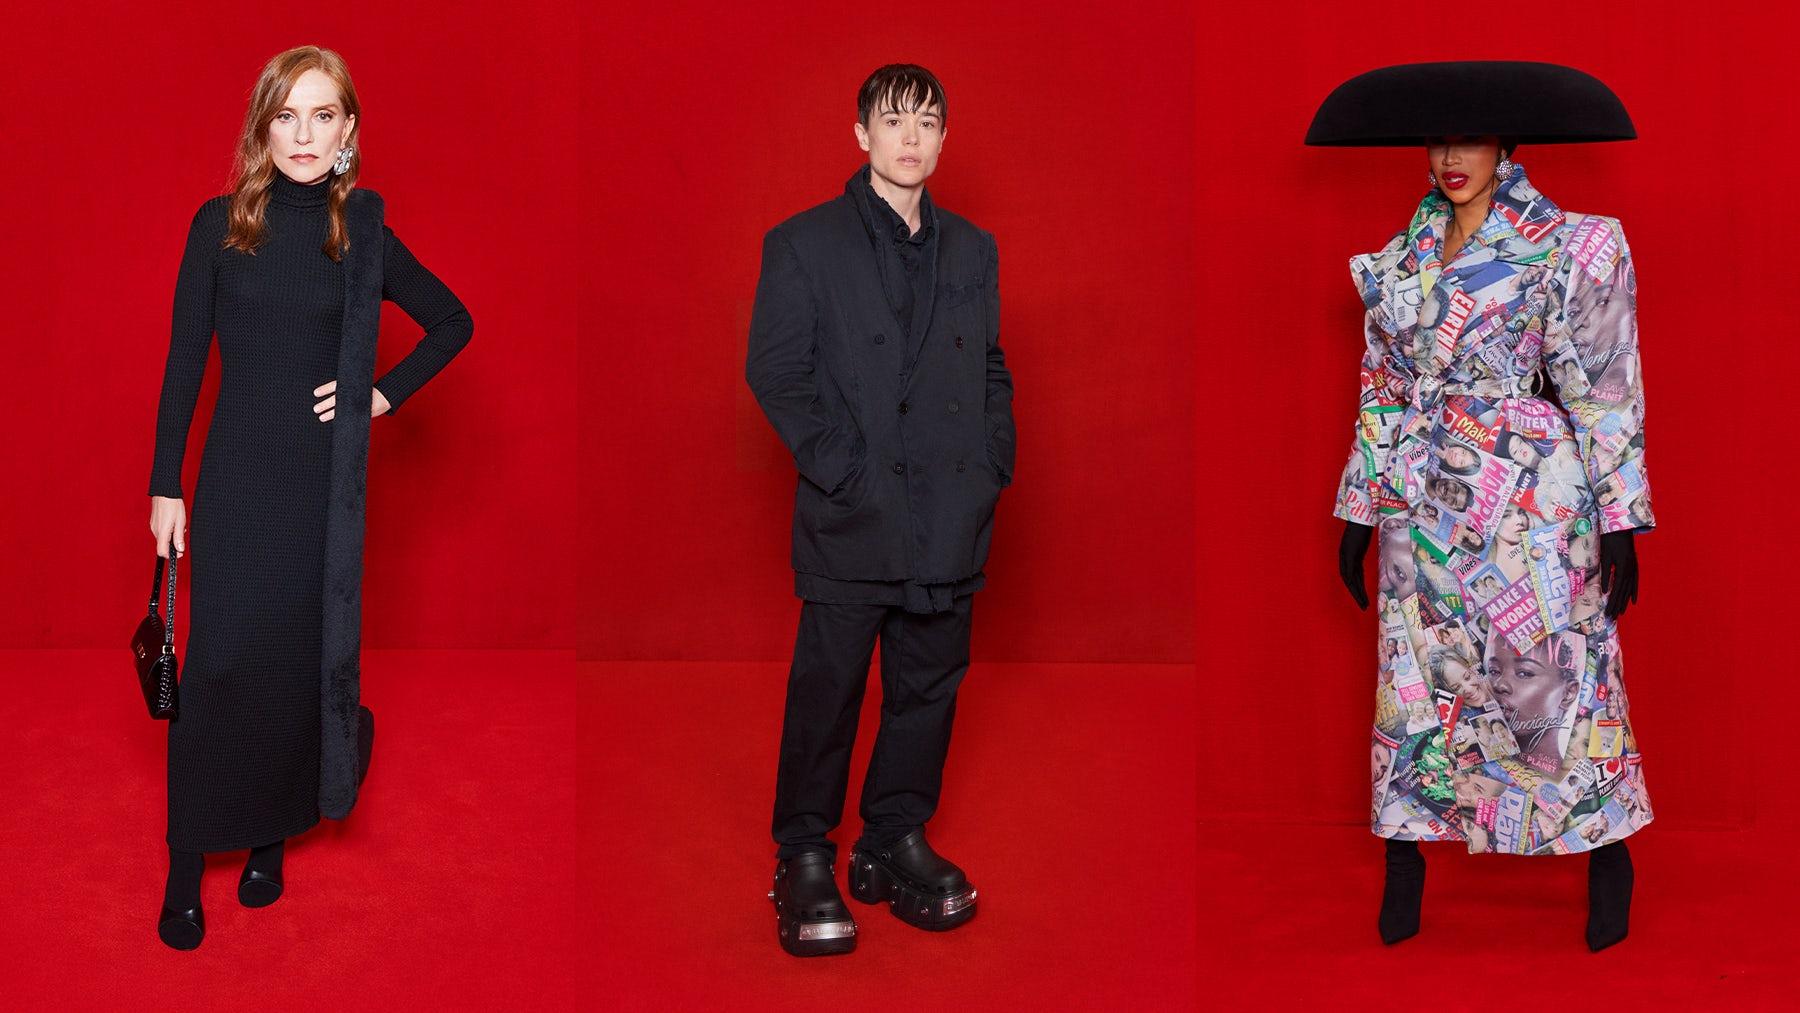 Isa Huppert, Eliot Page and Cardi B in looks from Balenciaga. Balenciaga.